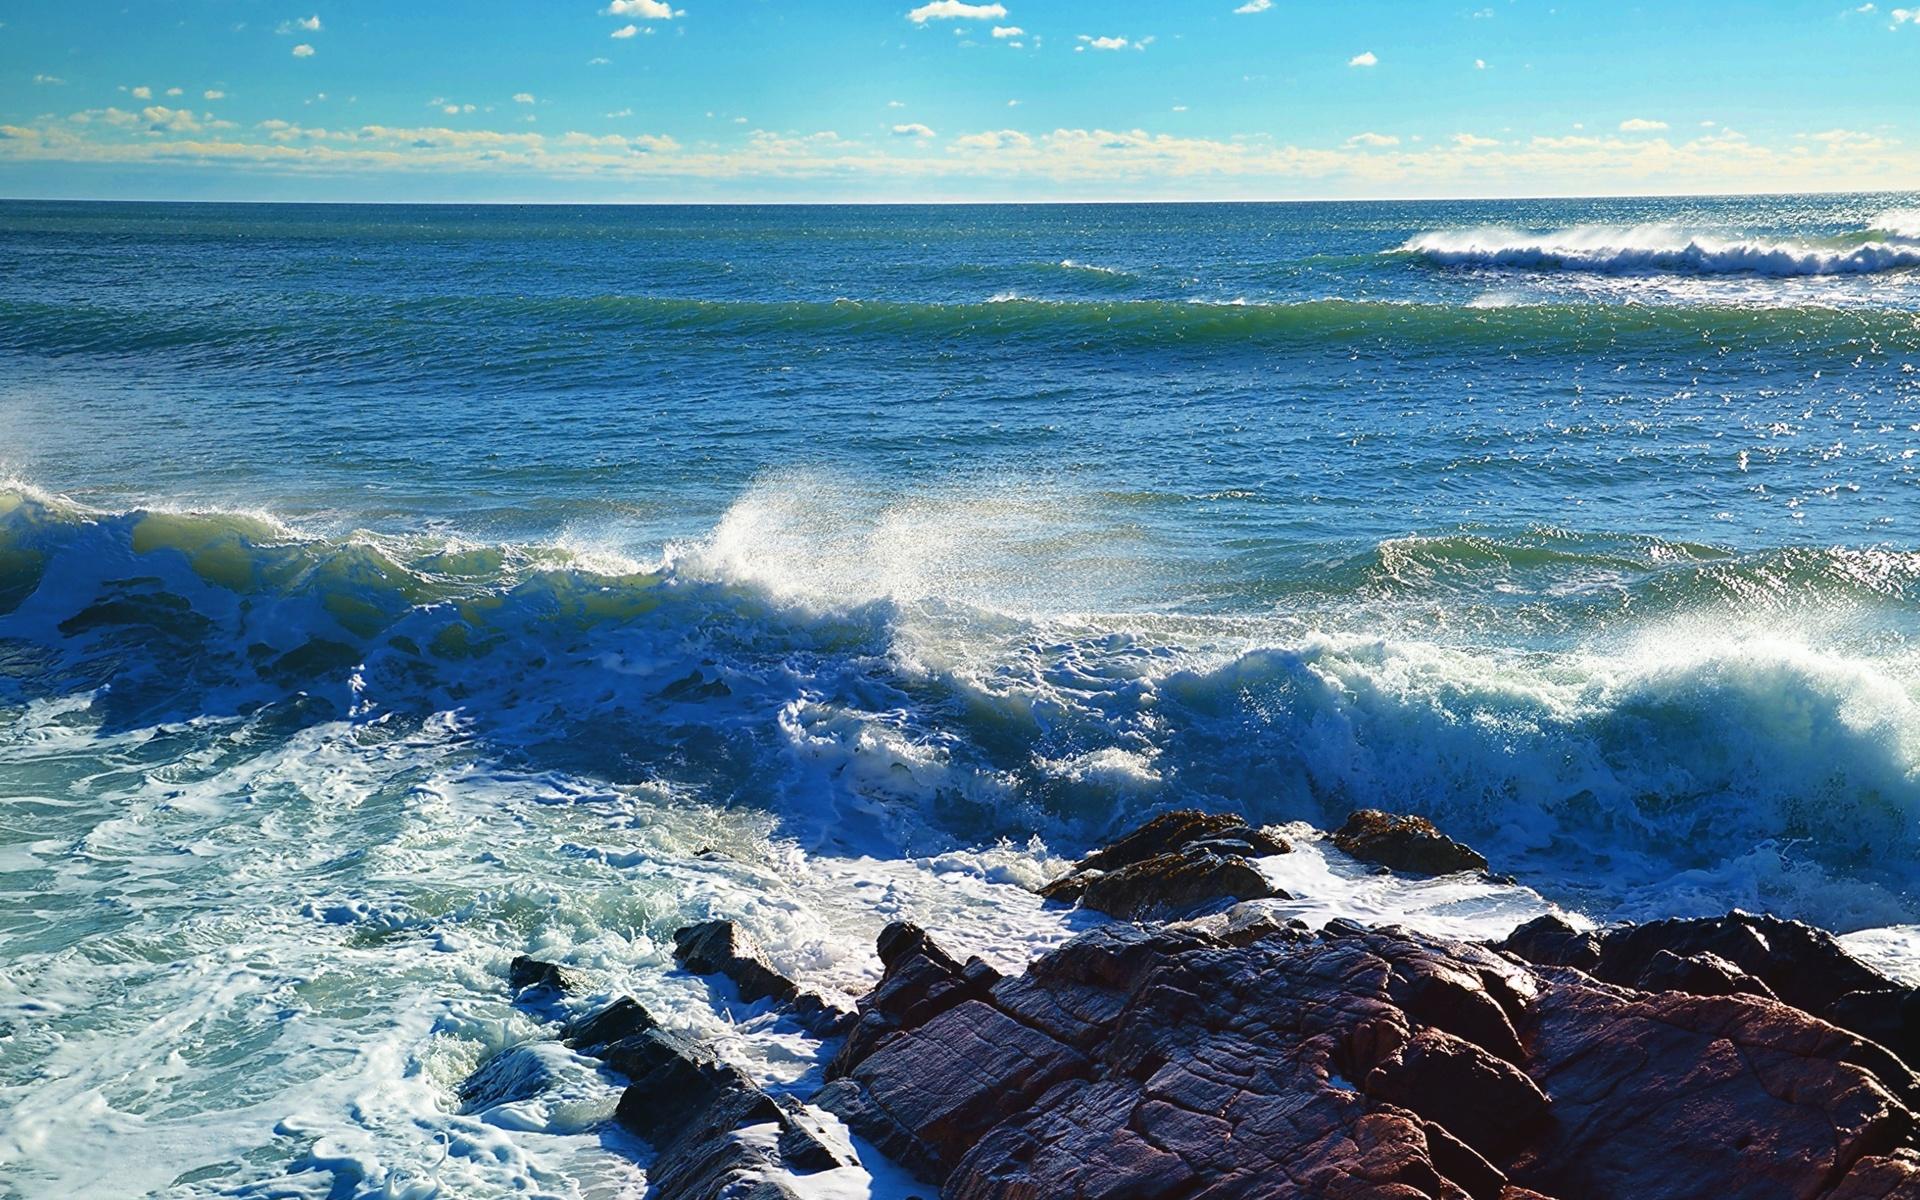 Берега японского моря приморский край фото как